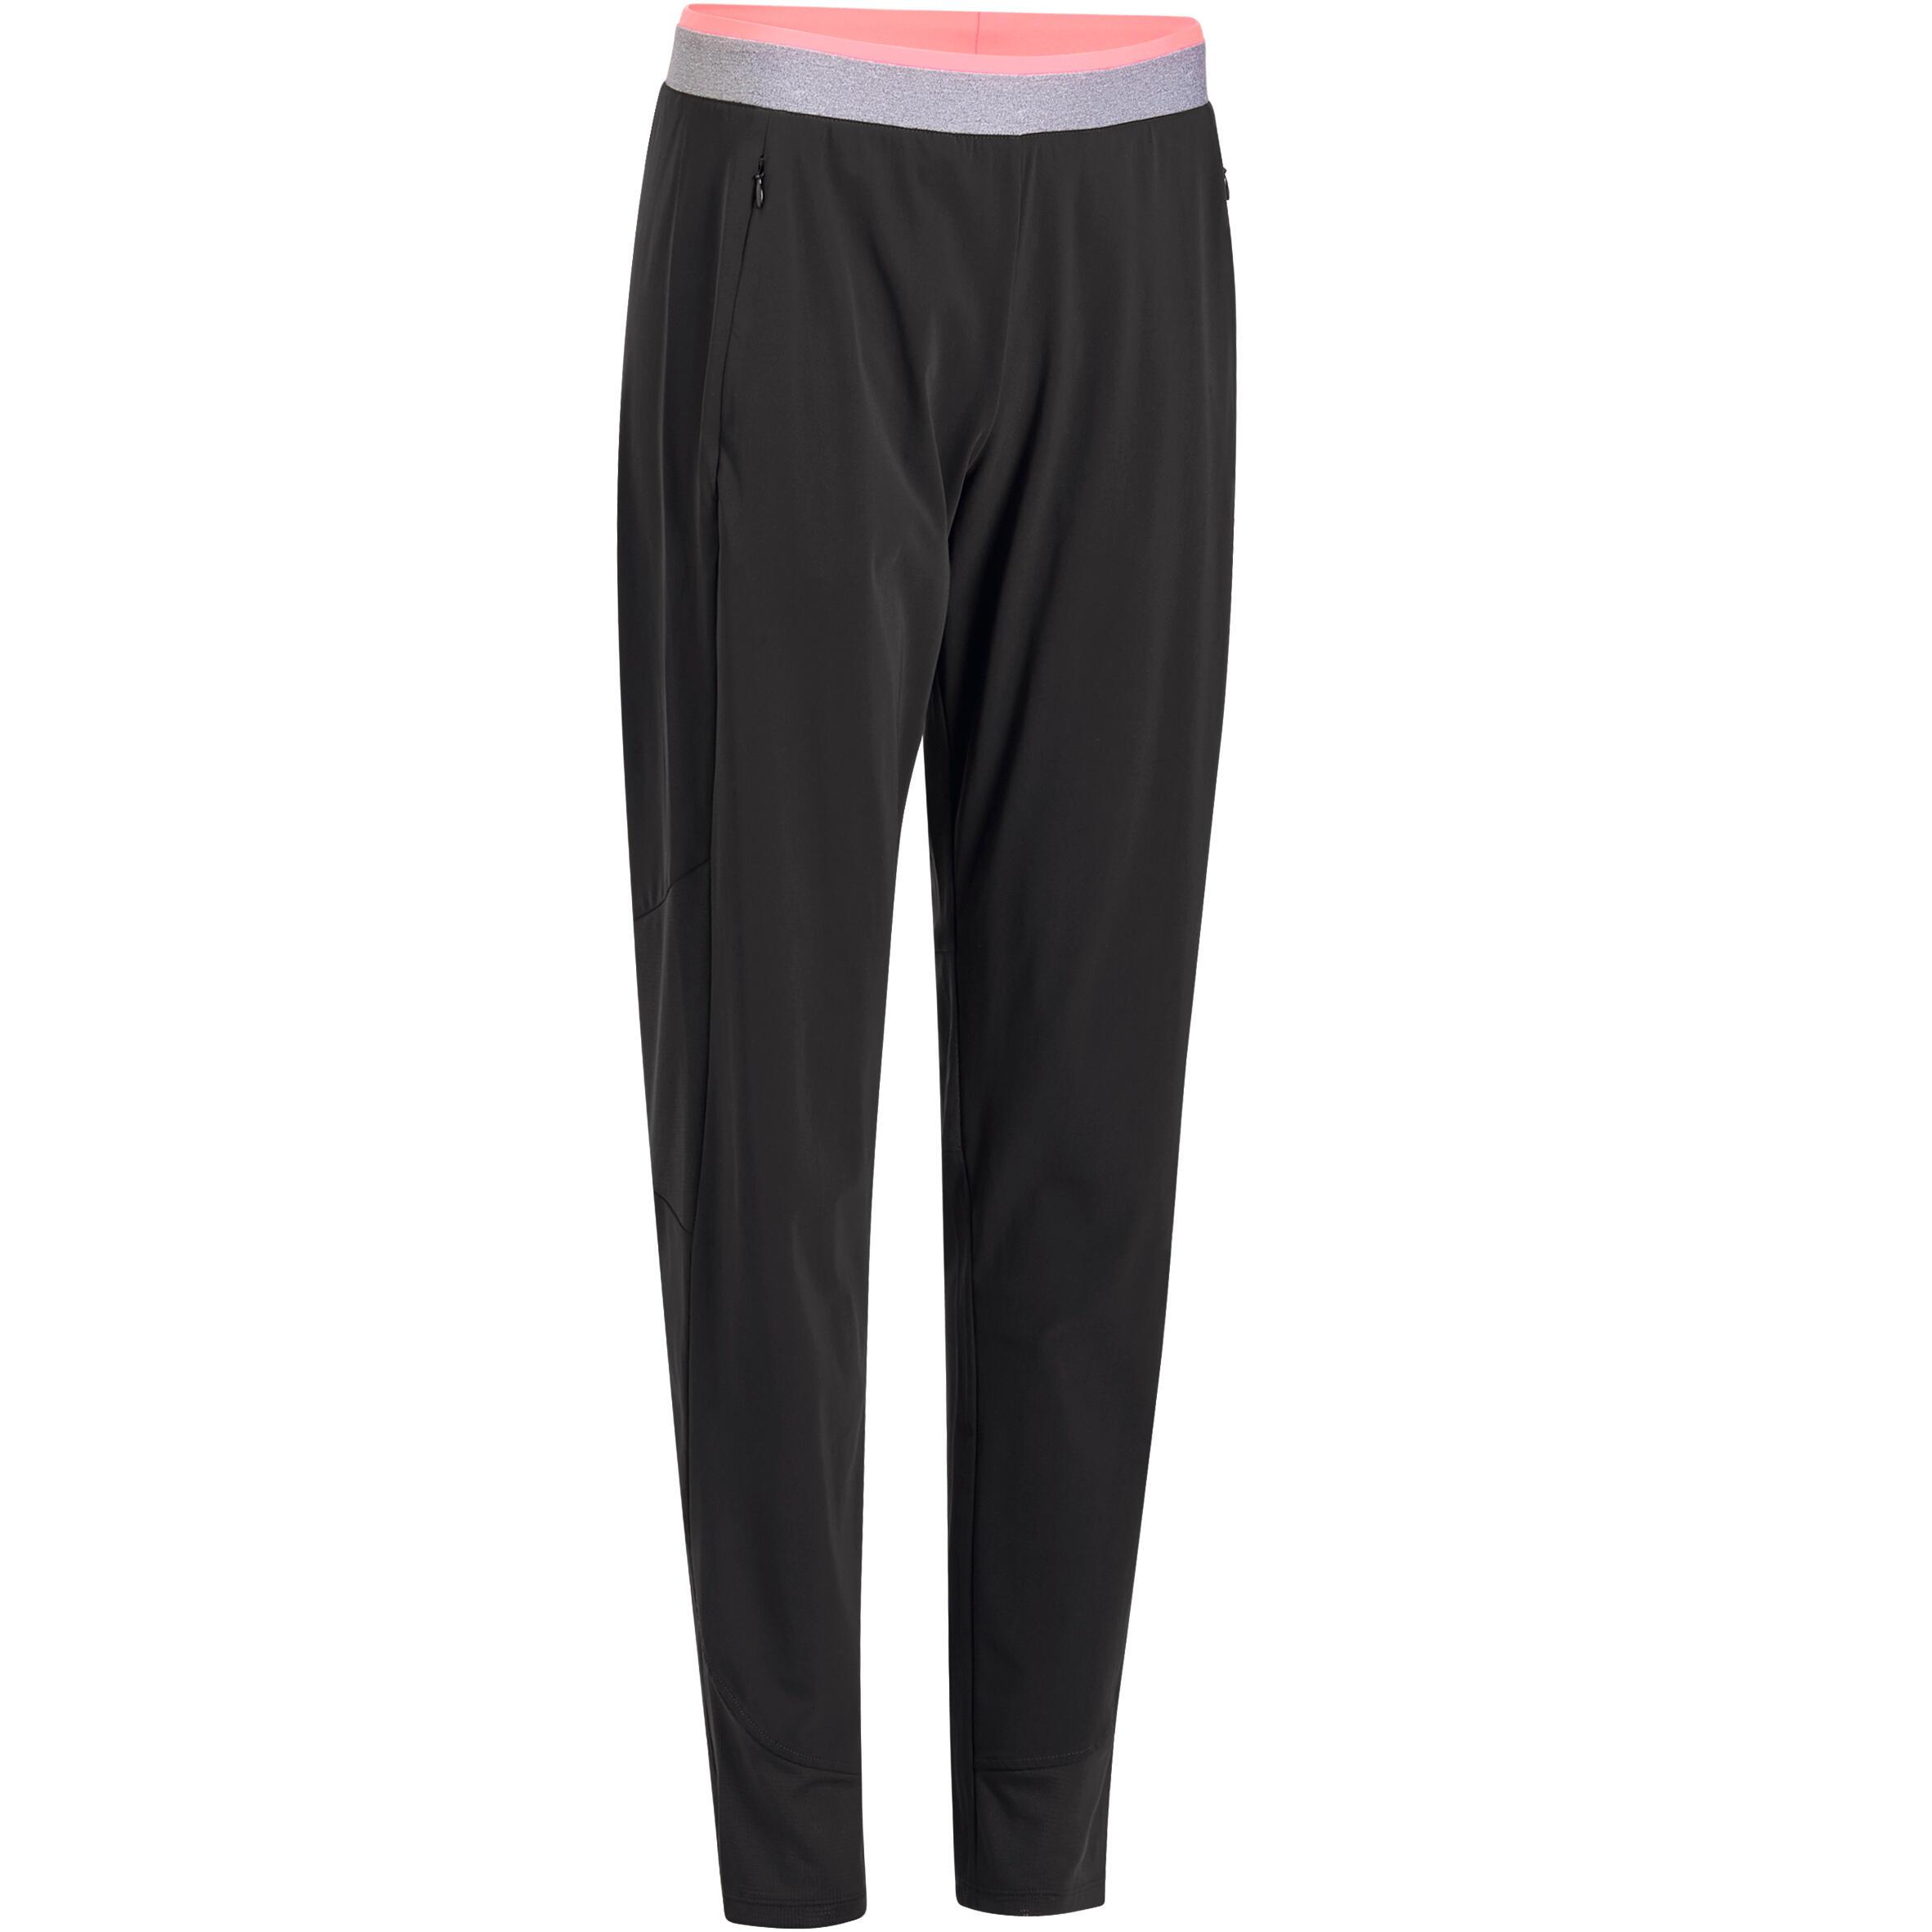 Pants regular fitness cardio mujer negro 100 Domyos